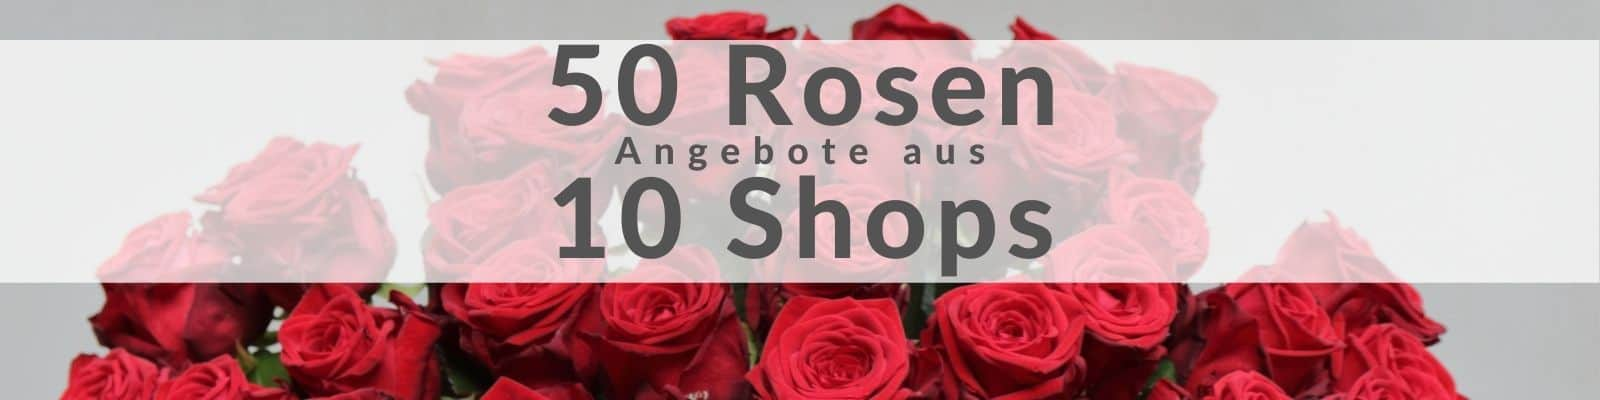 50 Rosen verschicken